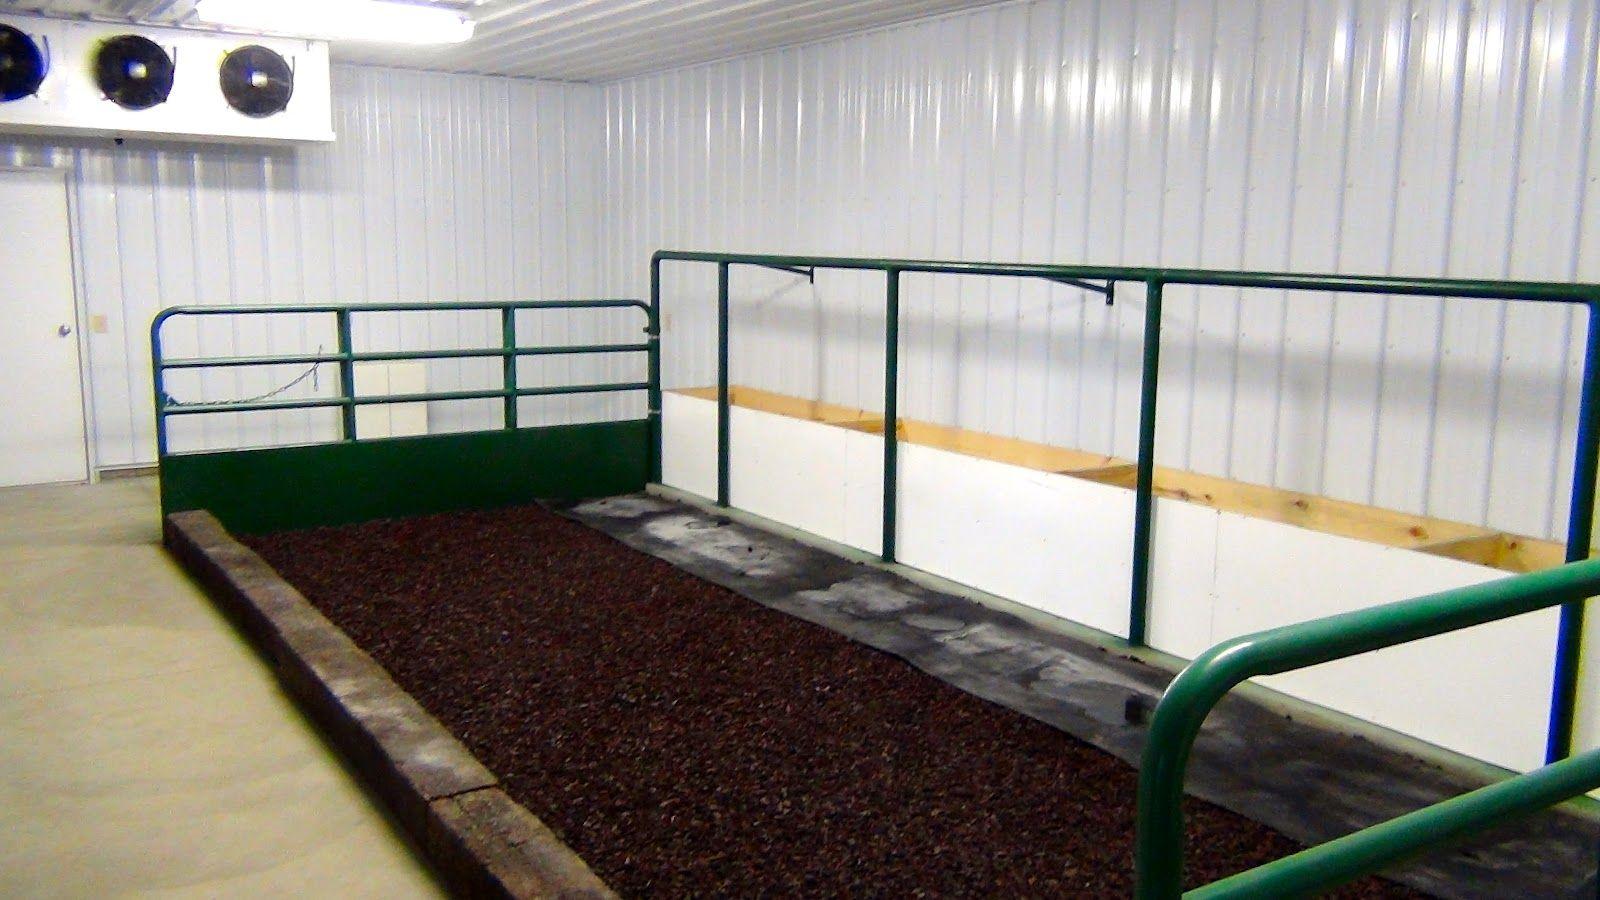 Show cattle barn on pinterest - Cool room designs ...